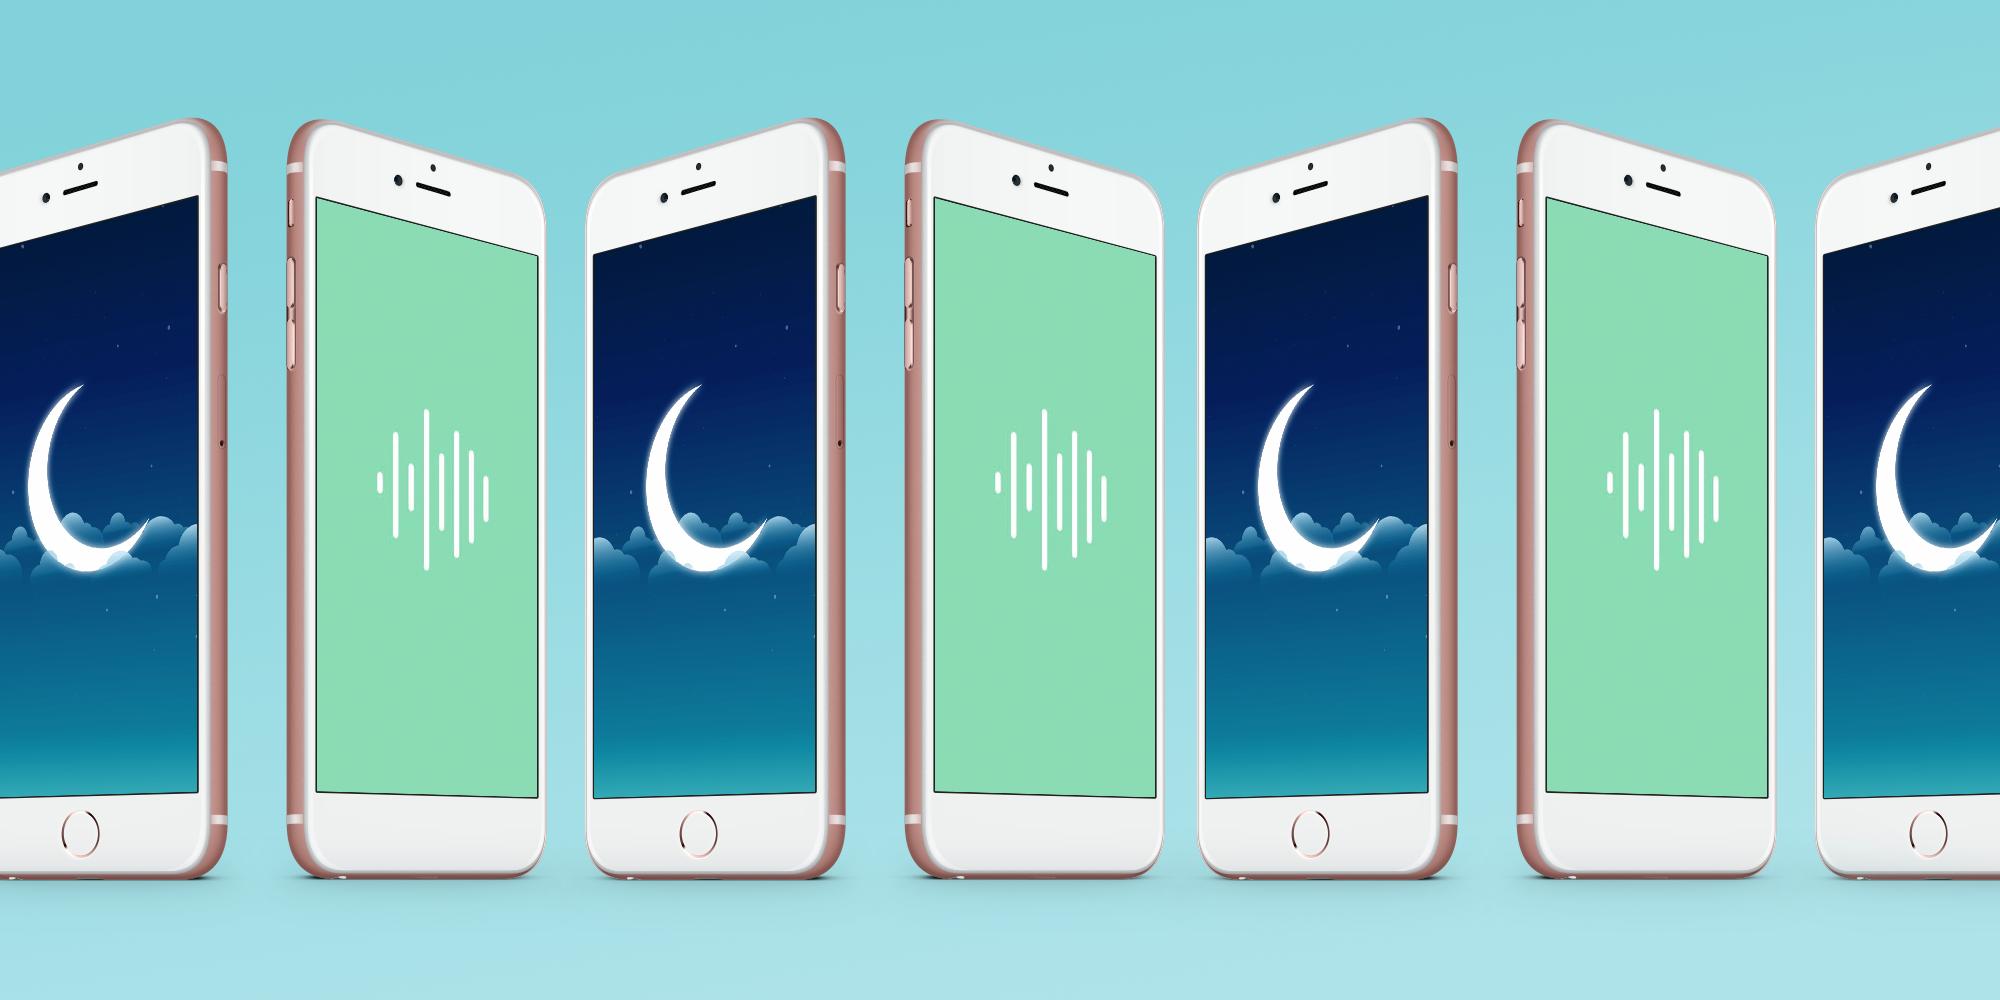 10 Best Sleep Apps 2021 - Phone Apps That Actually Help You Sleep